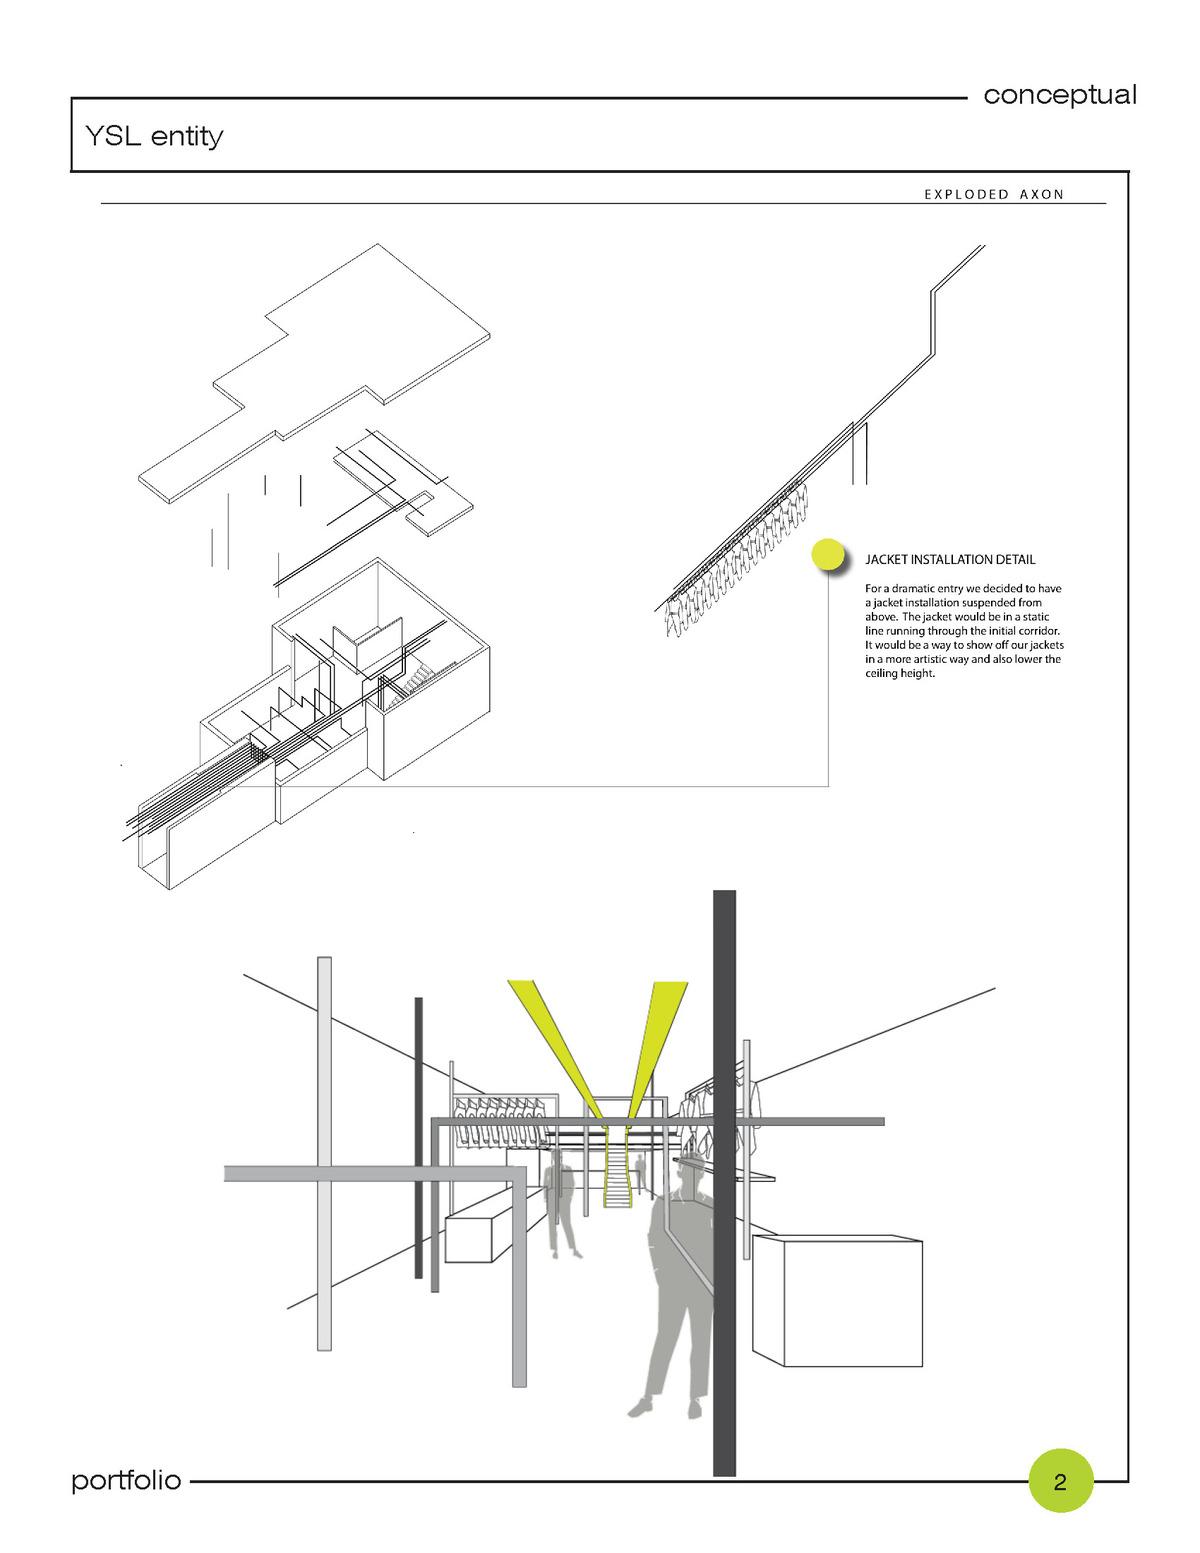 + interior; 3D conceptual views